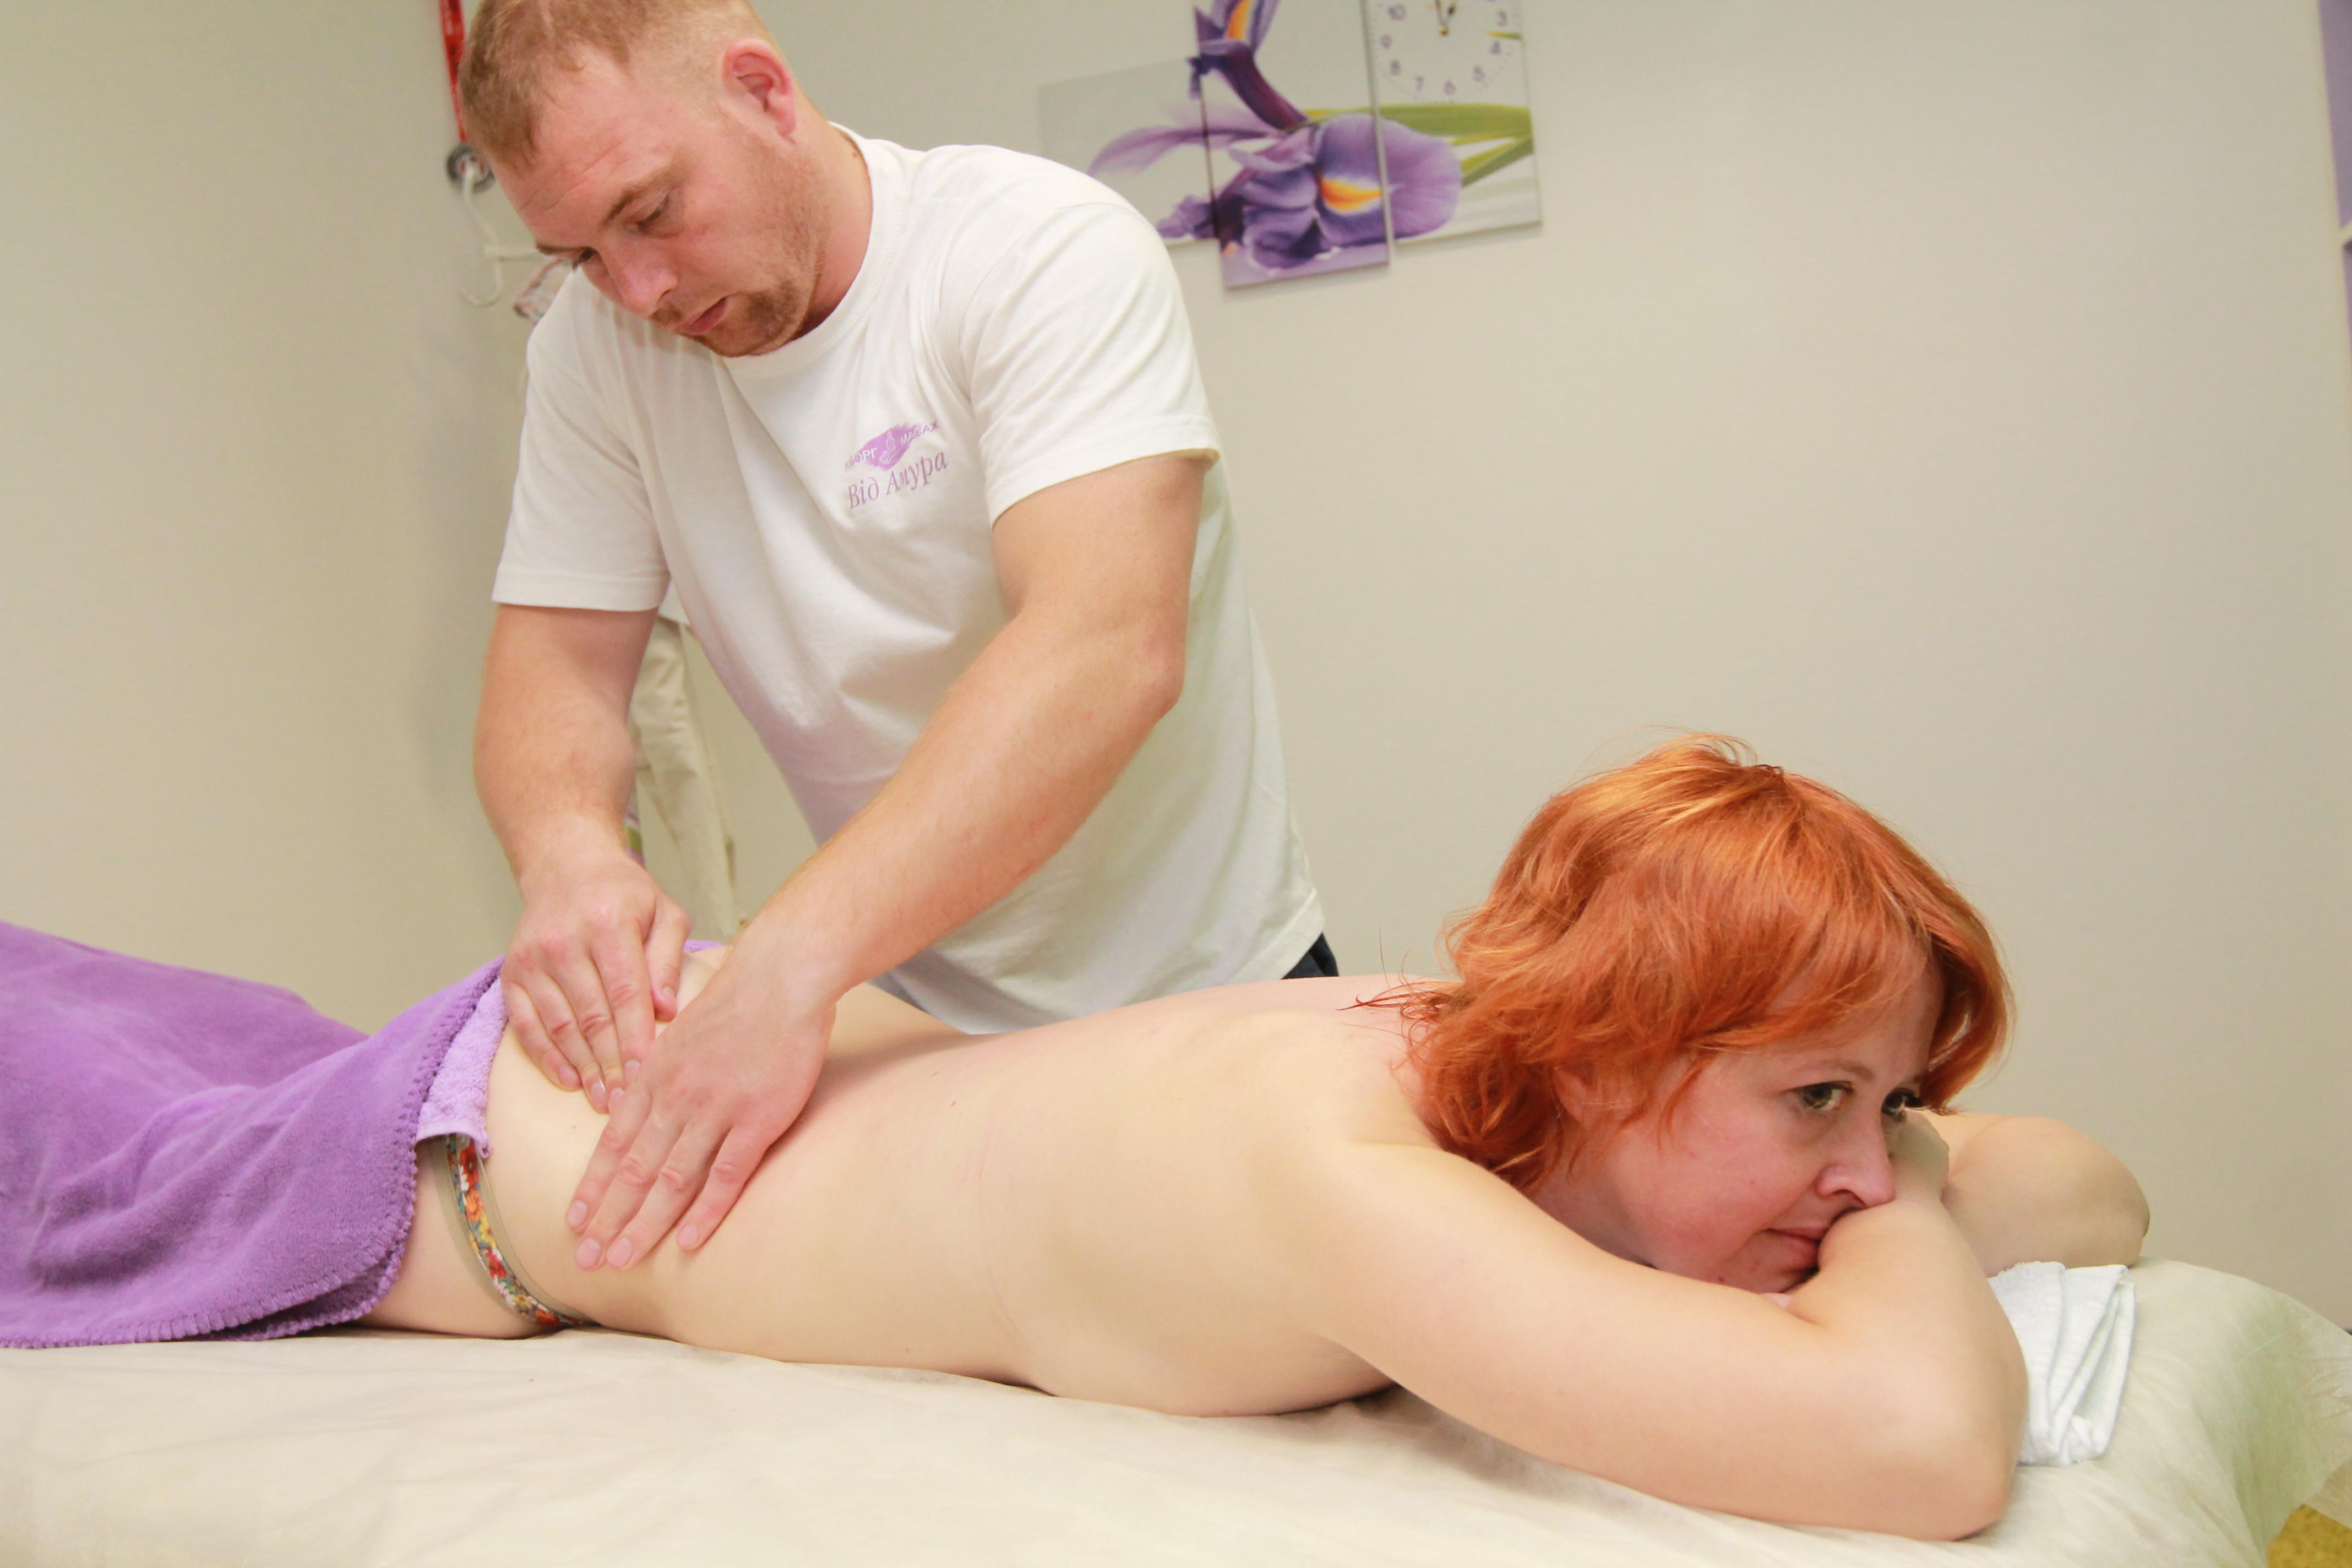 Фото кіборг масаж 3